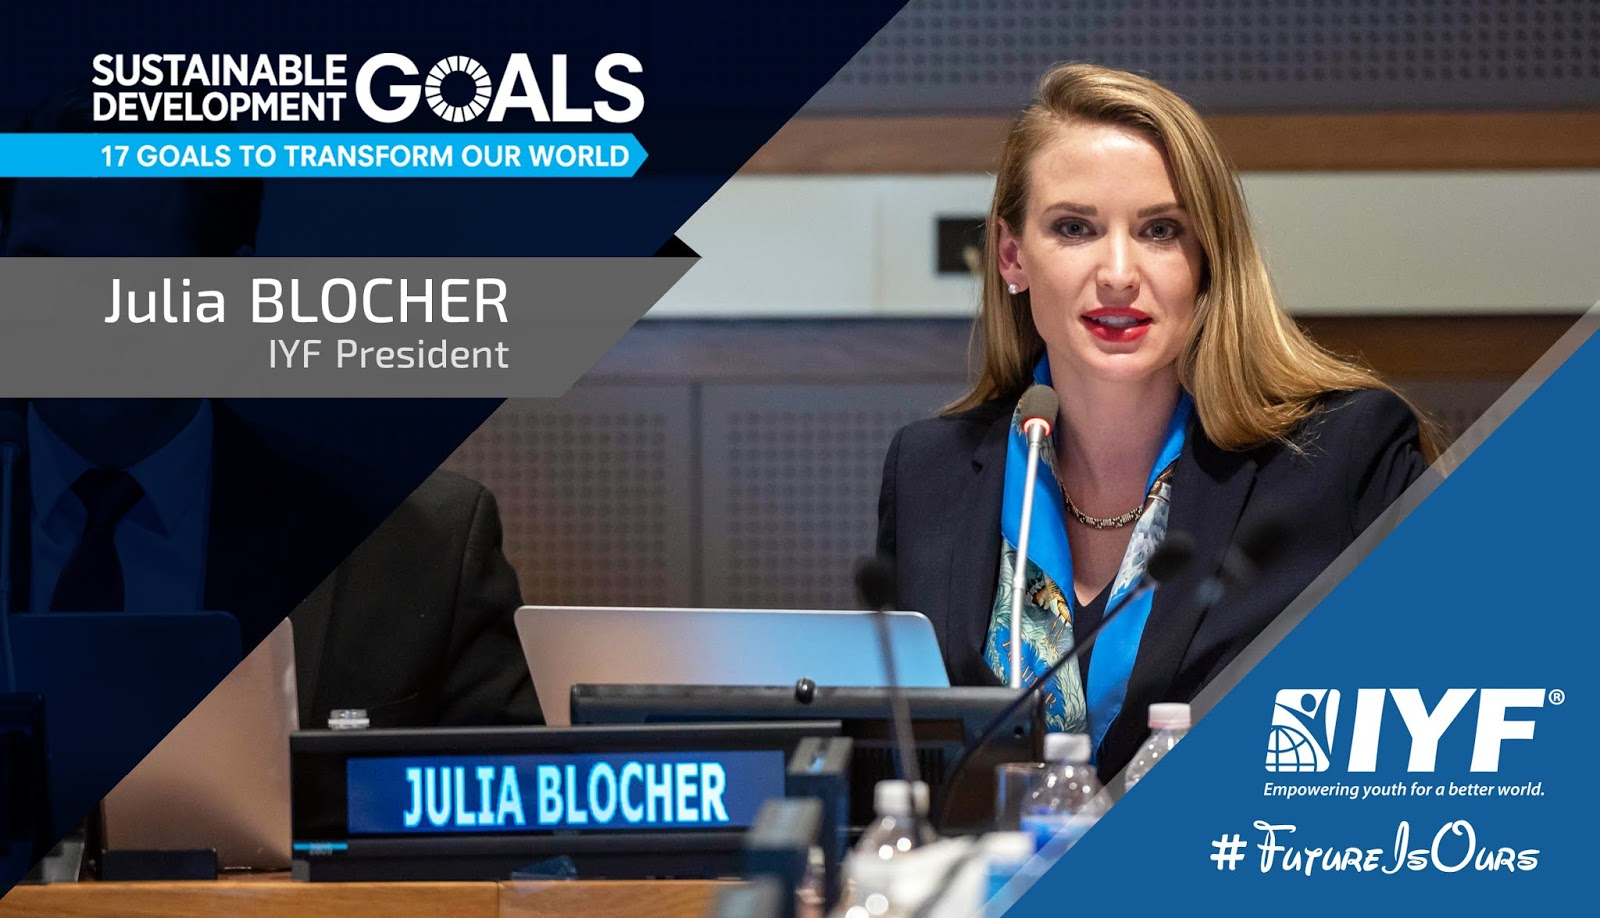 Julia BLOCHER, IYF President